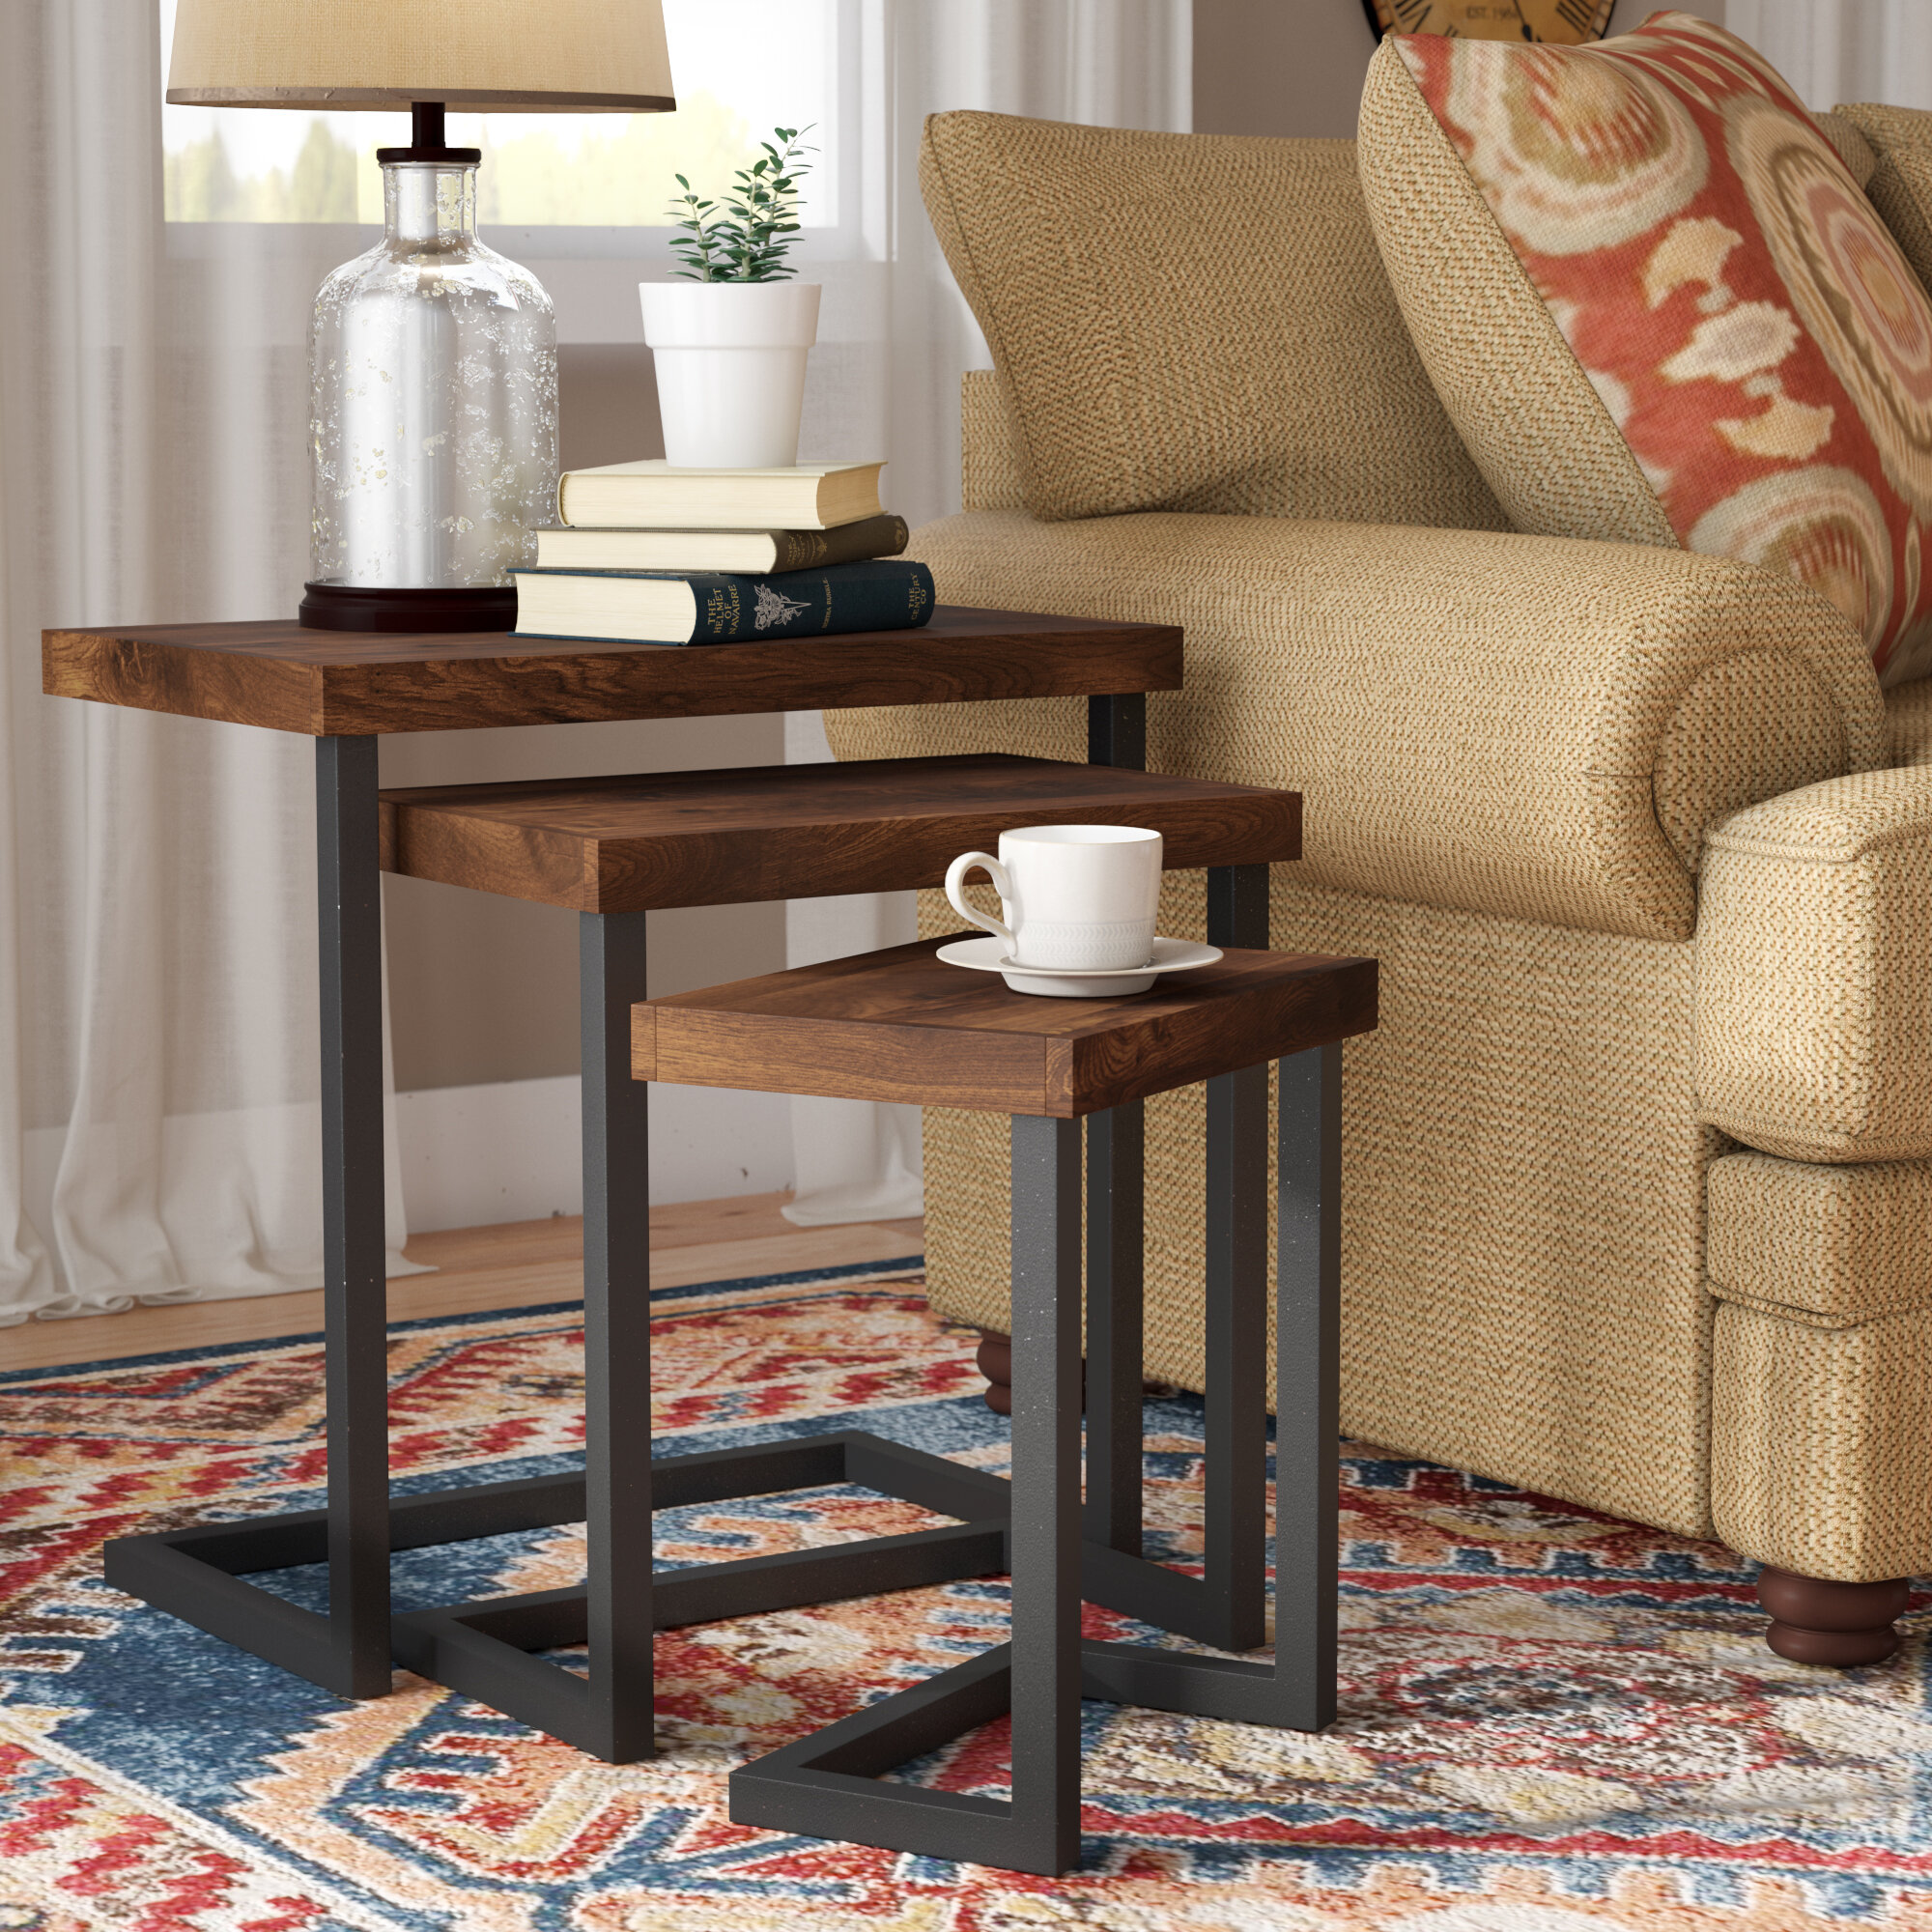 Trent austin design crenata 3 piece nesting tables reviews wayfair watchthetrailerfo